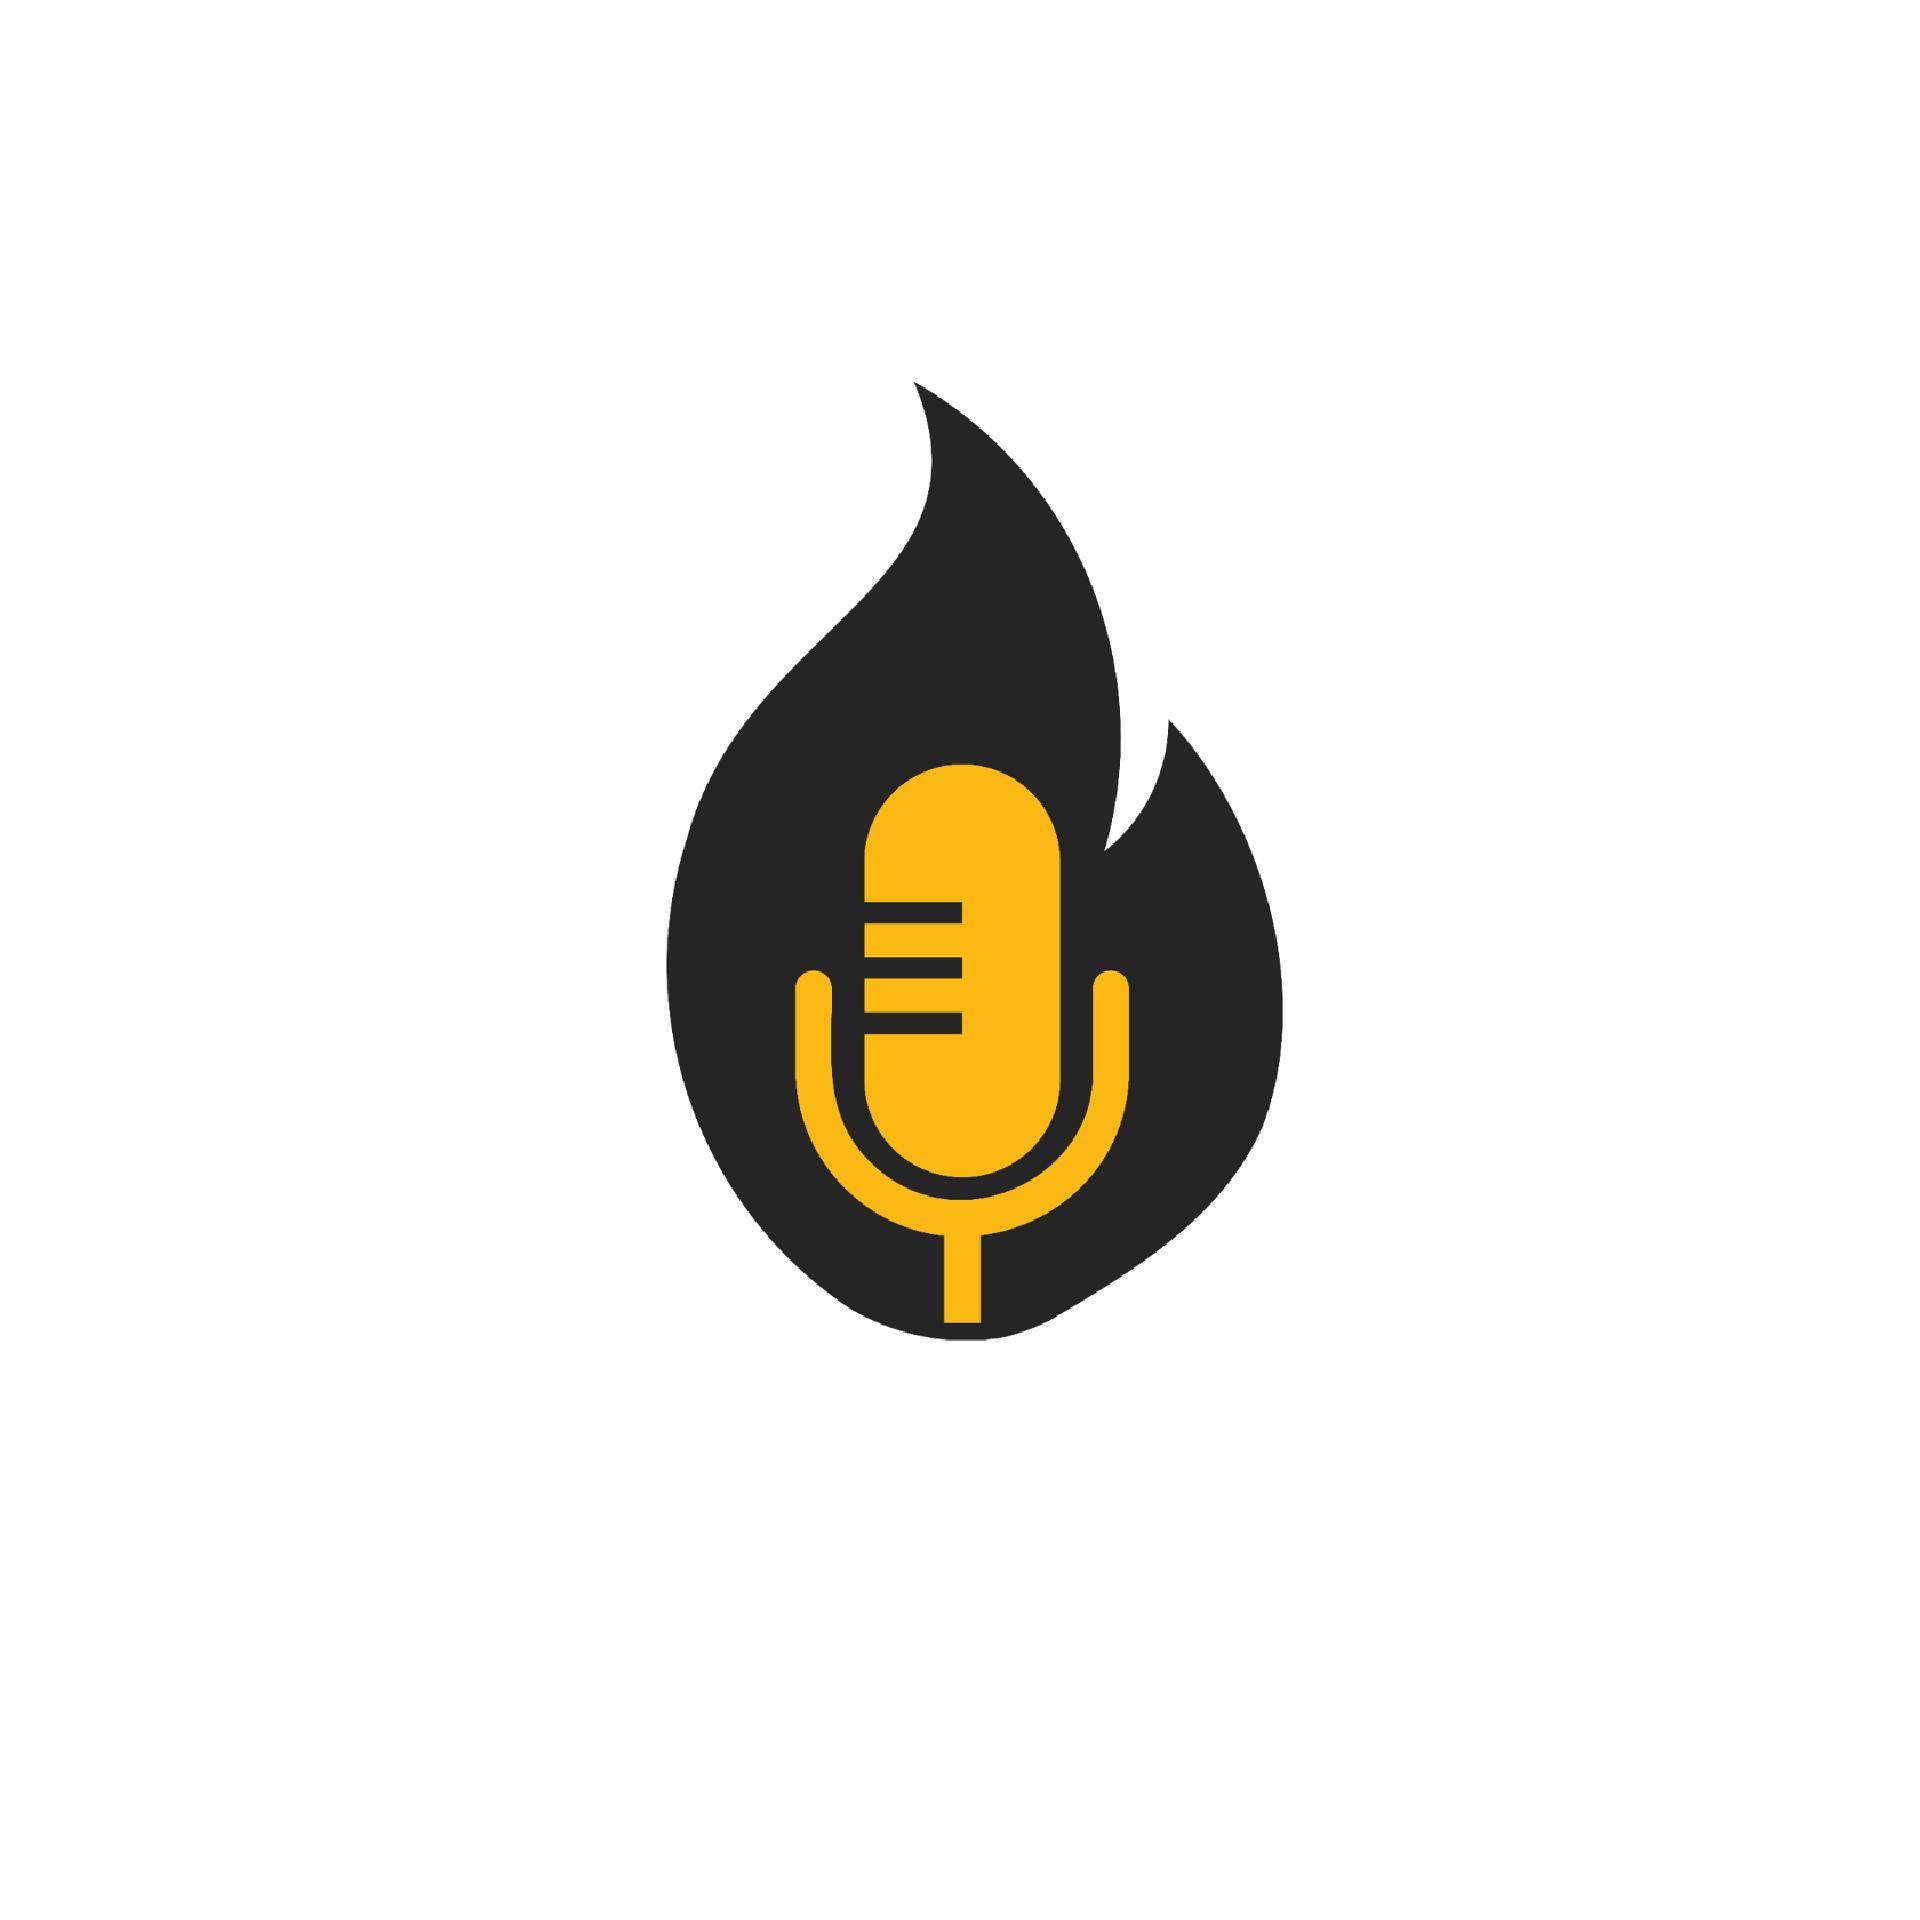 RADIO LIBERTAD 99.7 TE ACTIVA